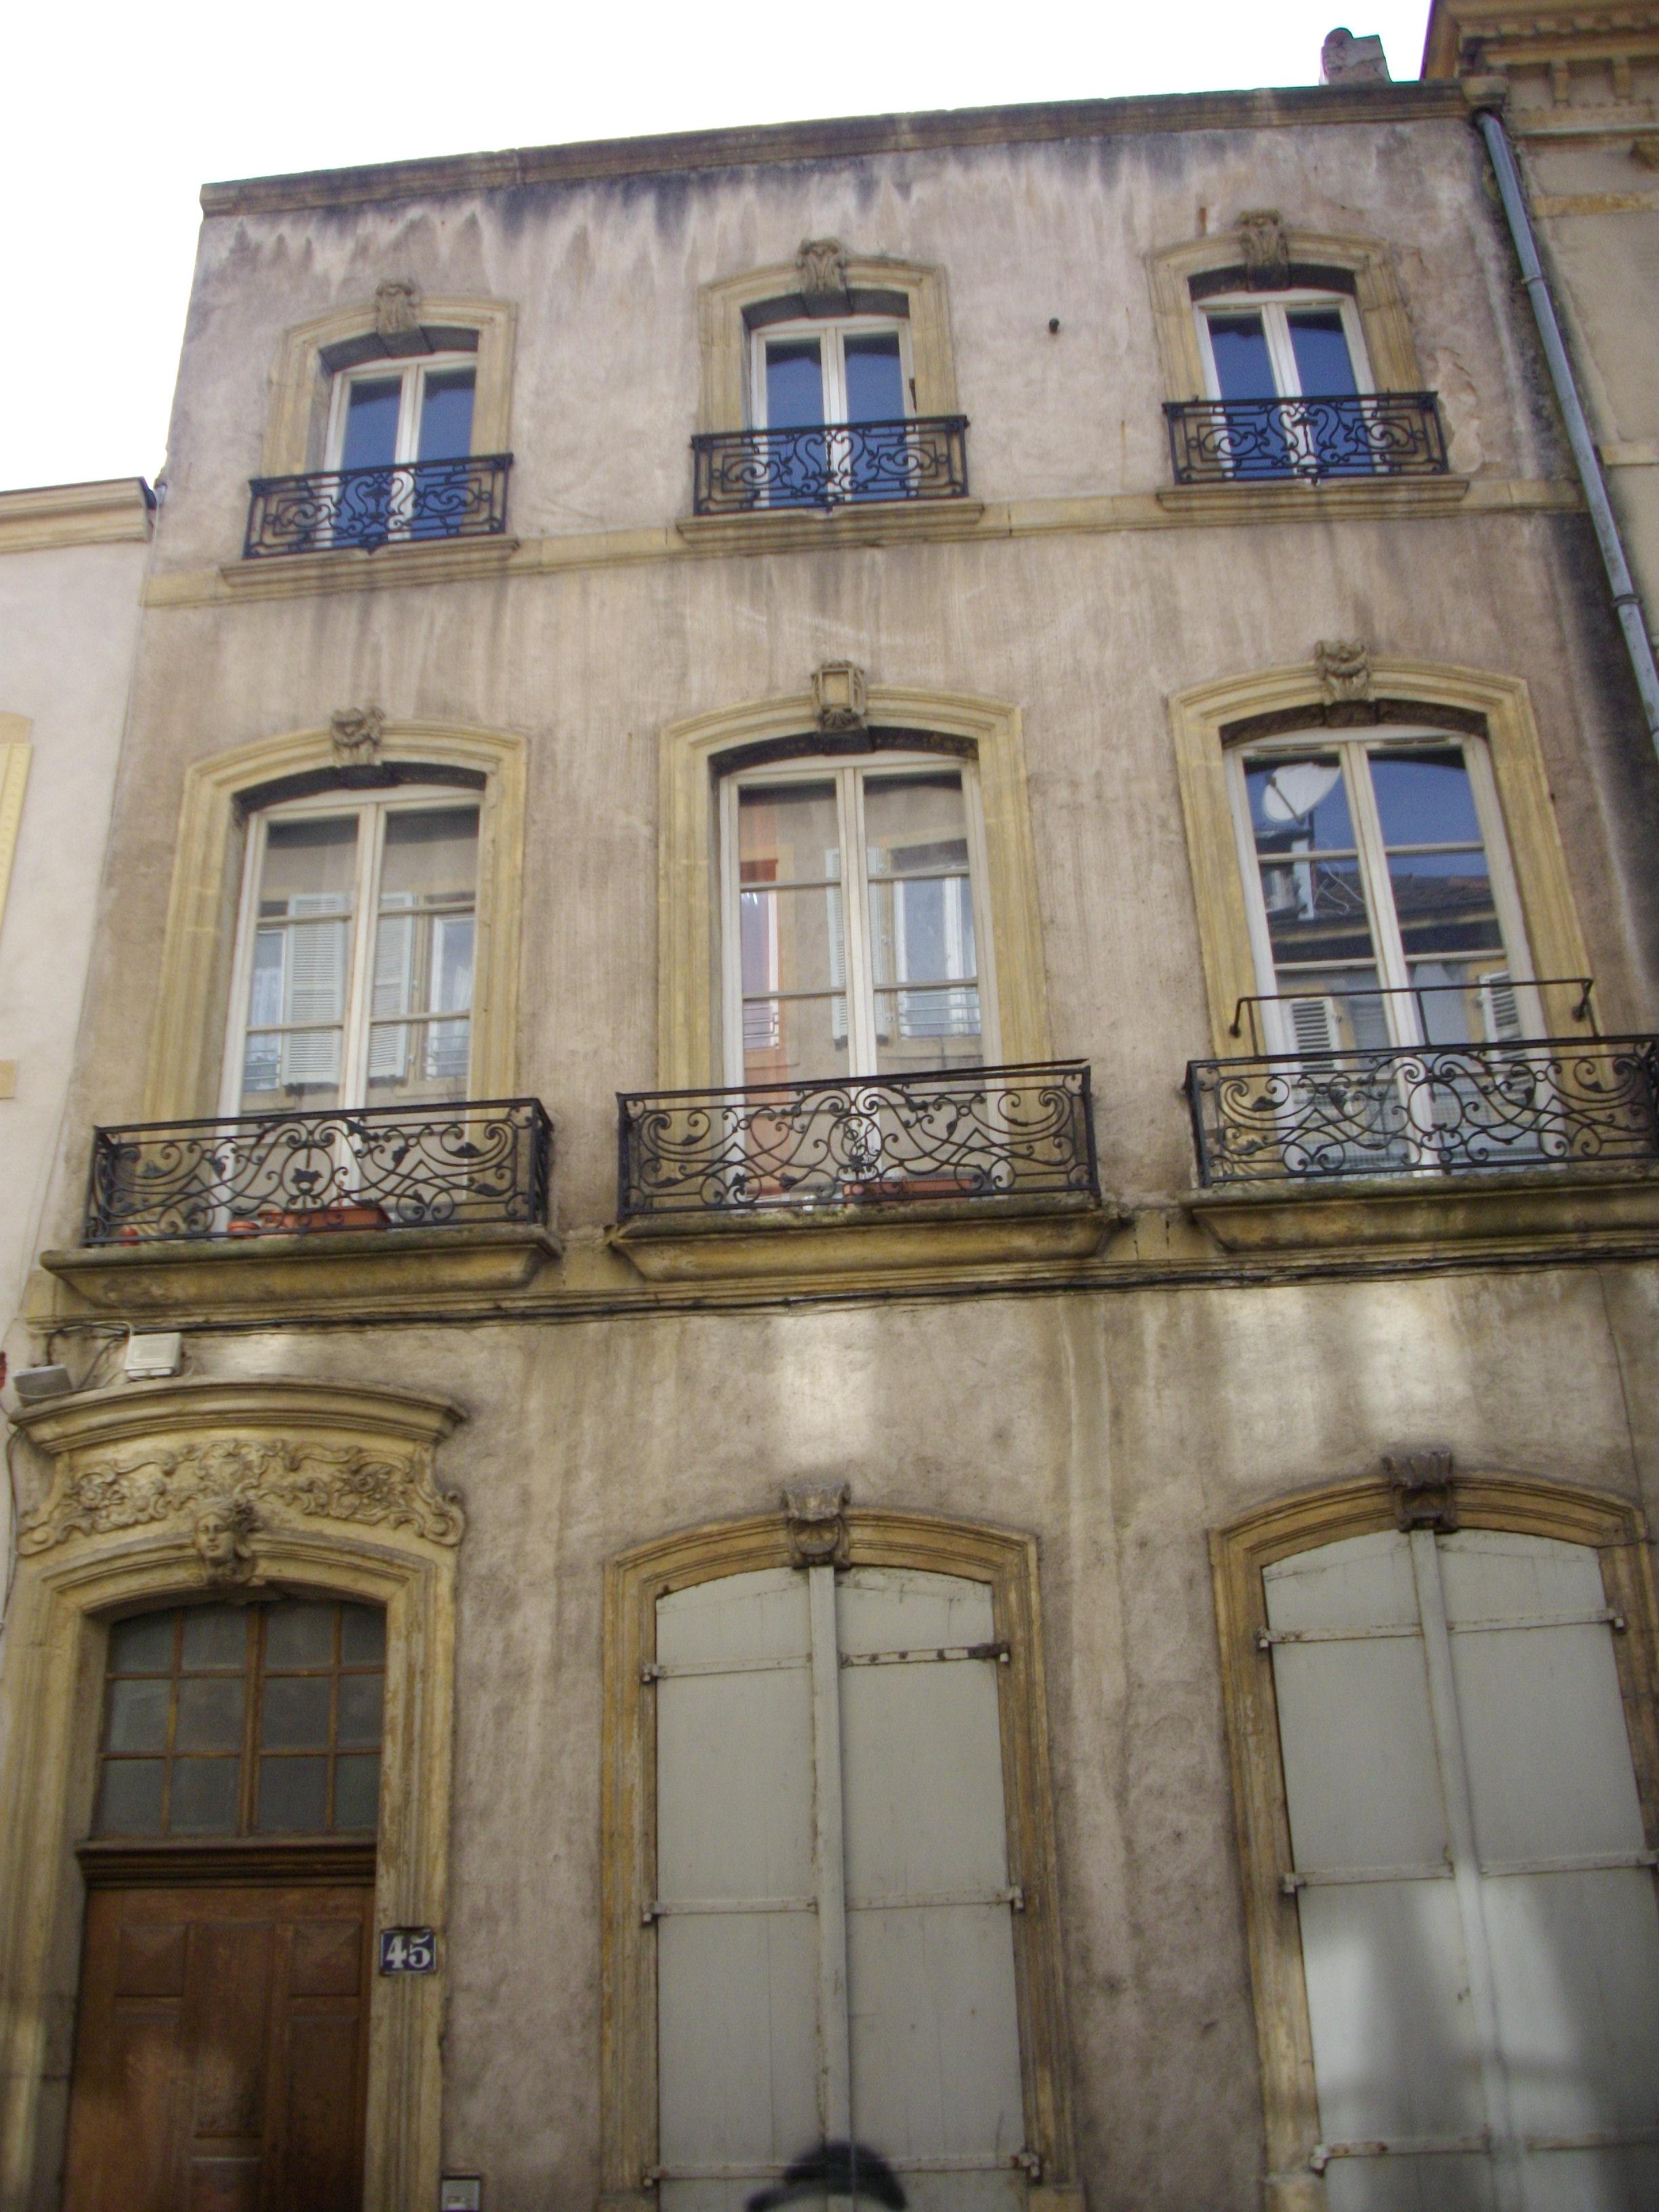 fichier:metz - 45, rue vigne-saint-avold — wikipédia